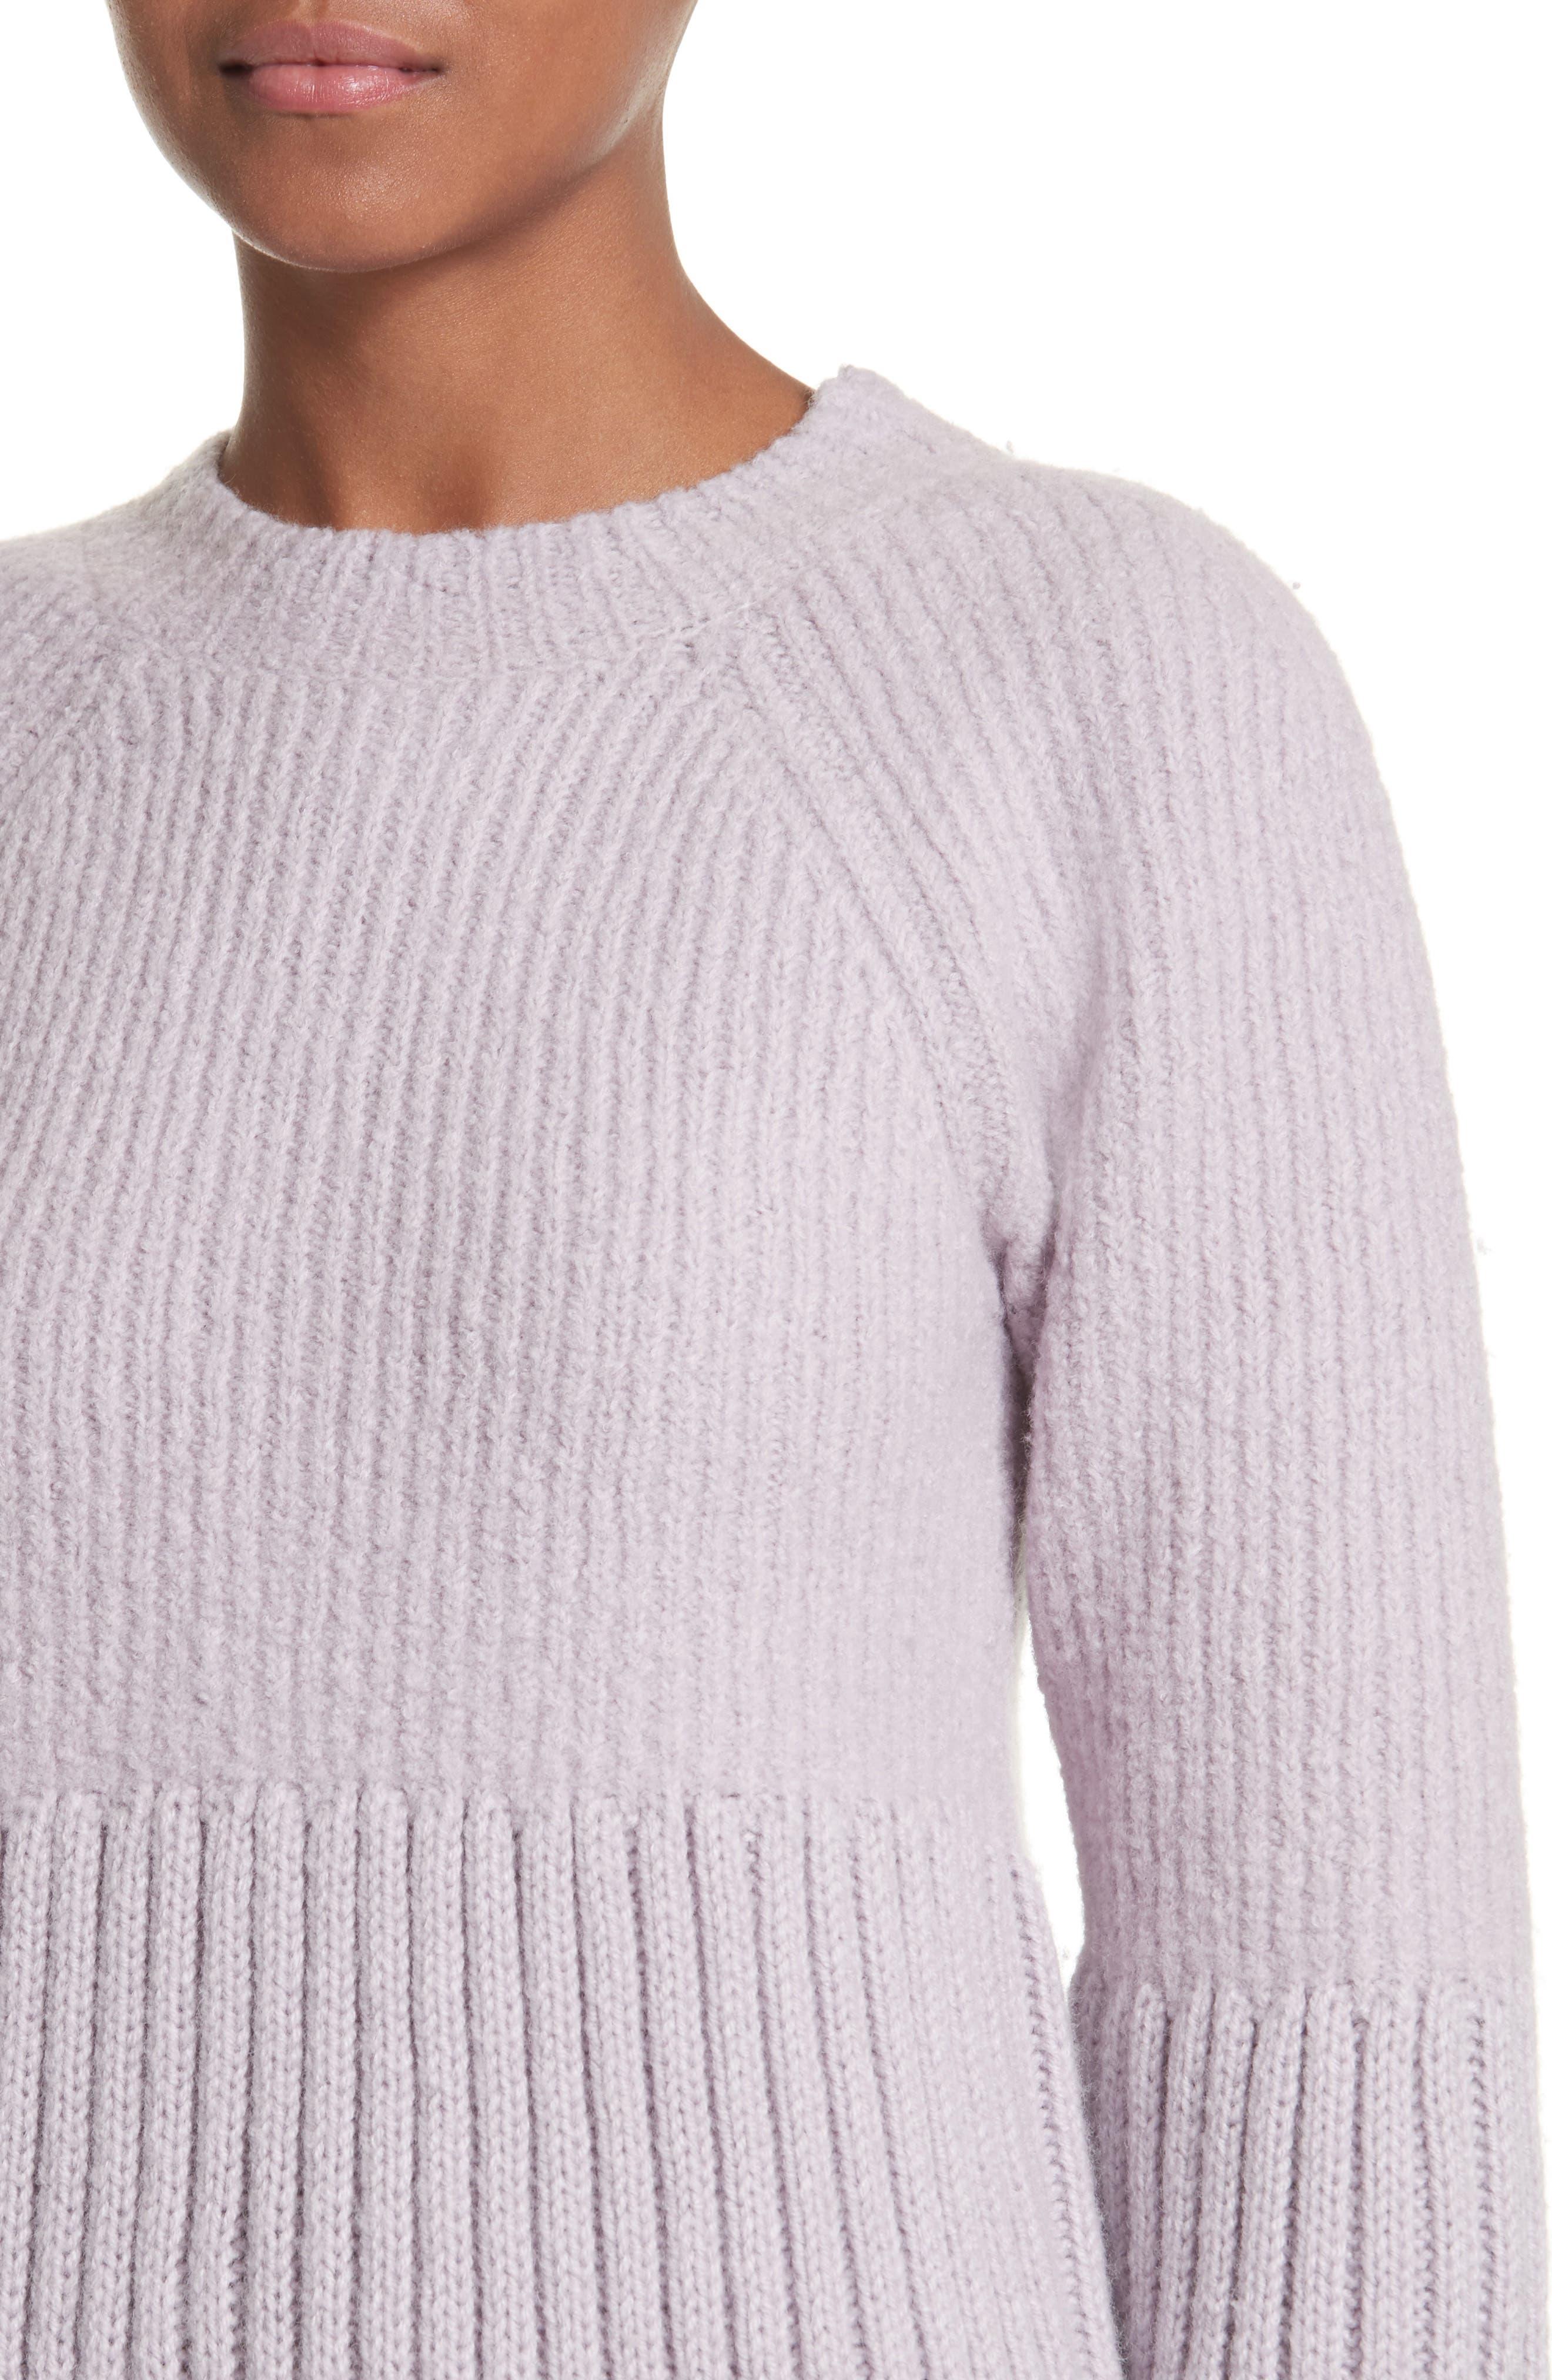 Wool Tunic Sweater,                             Alternate thumbnail 4, color,                             Lavendar